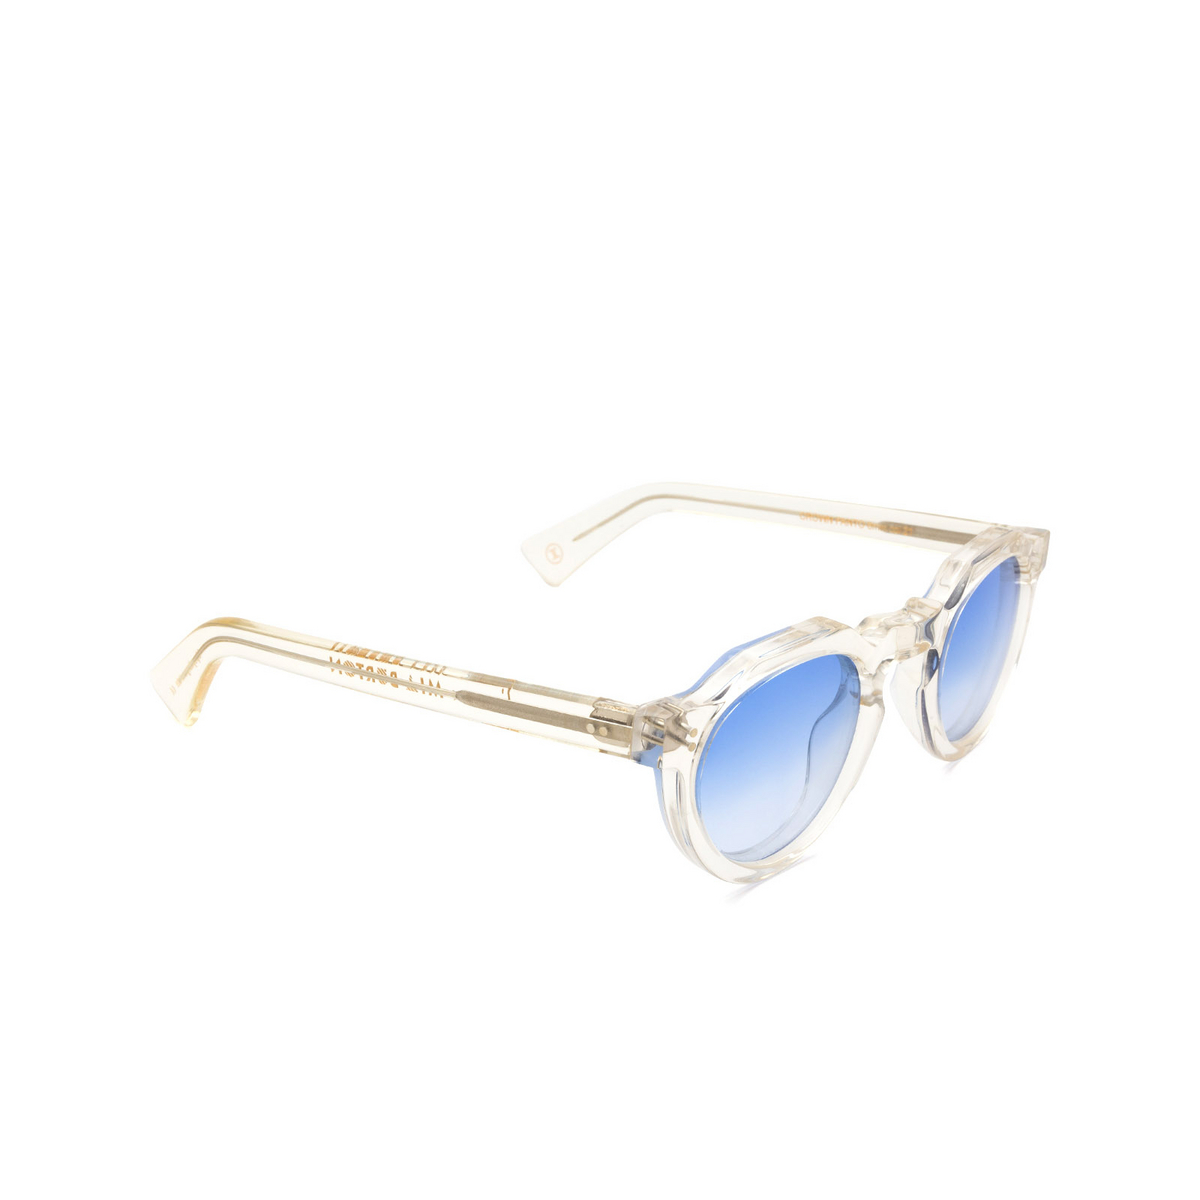 Lesca® Irregular Sunglasses: Crown Panto X Mia Burton color 21 - COOL / RADIANT GRADIENT - three-quarters view.